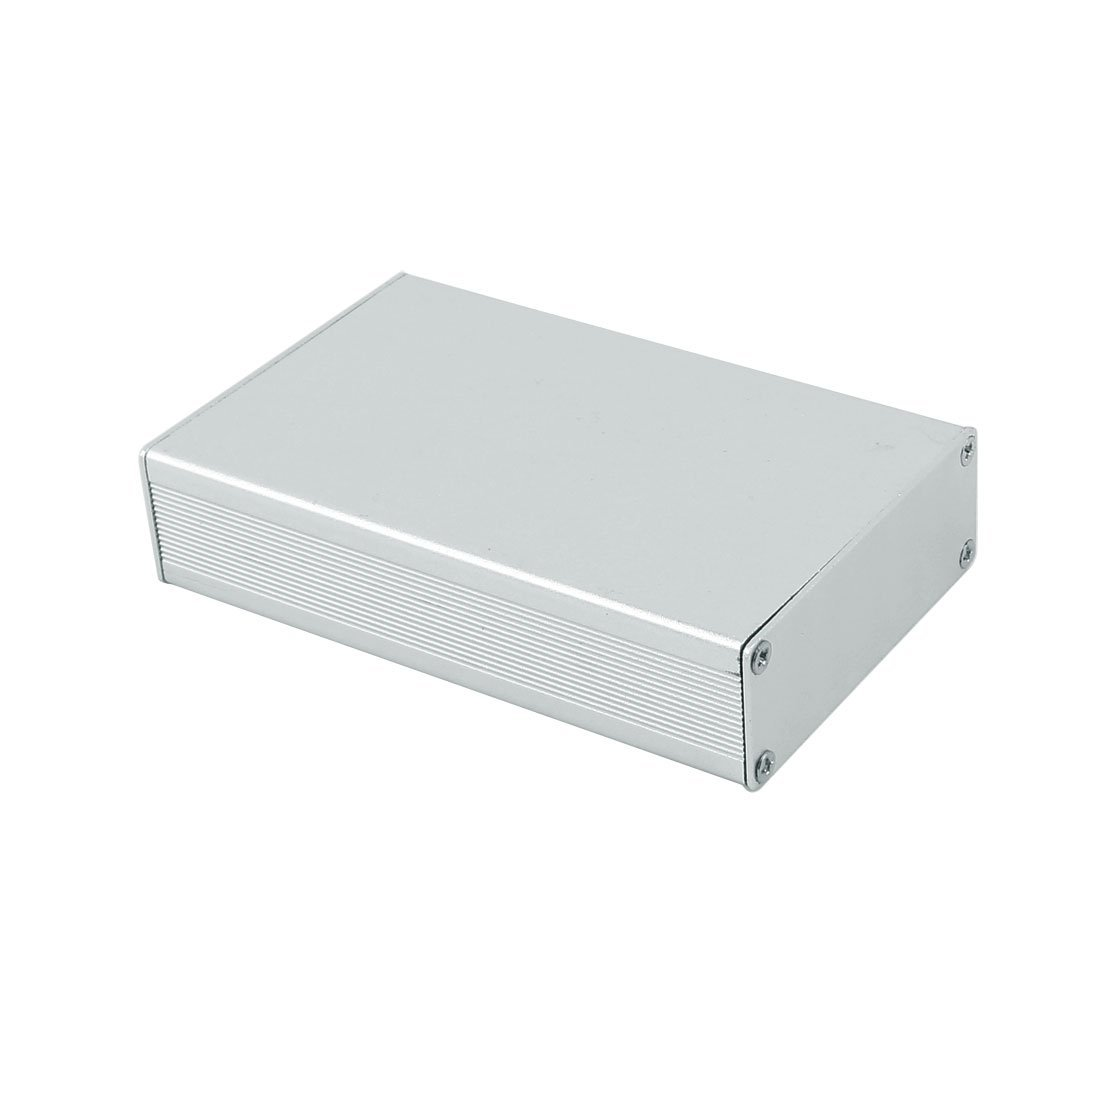 Amazon.com: eDealMax 102 x 64 x 23 mm Polivalente de aluminio extruido carcasa de la caja de Plata del tono: Electronics